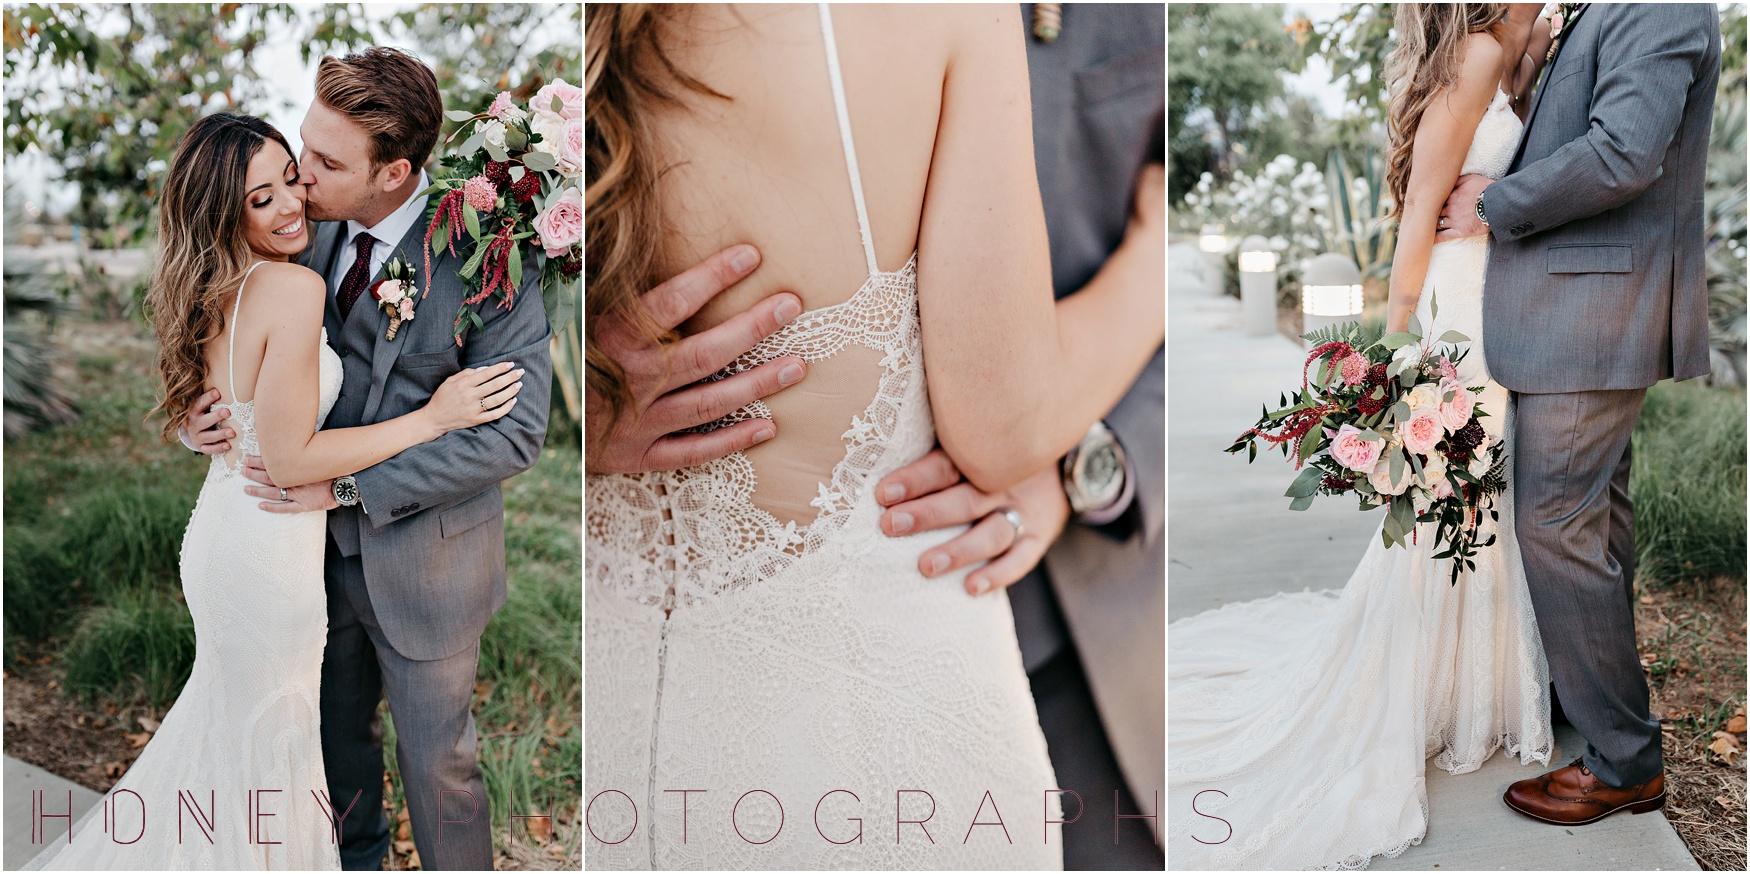 garden-classic-burgundy-jewel-tone-luxury-pacific-event-oceanside-wedding45.jpg